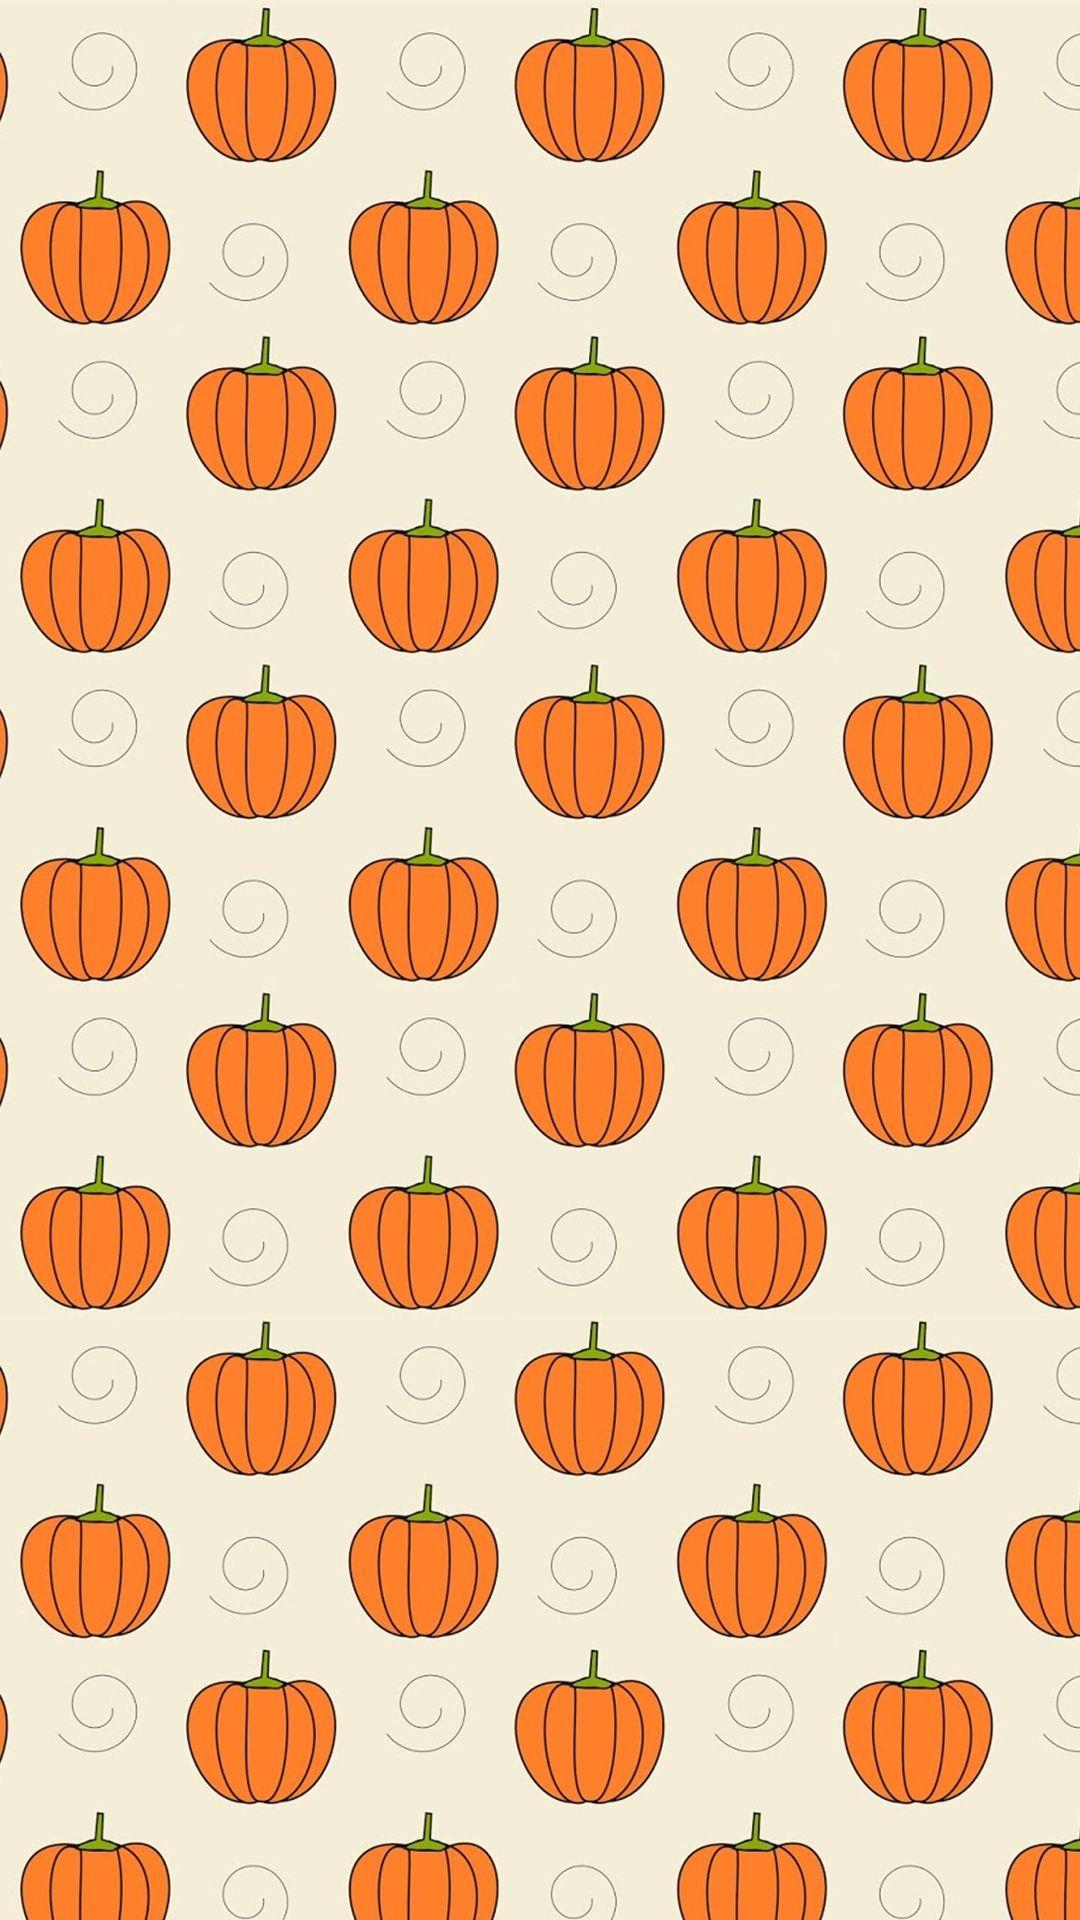 Cute Halloween Wallpapers   Top Cute Halloween Backgrounds 1080x1920